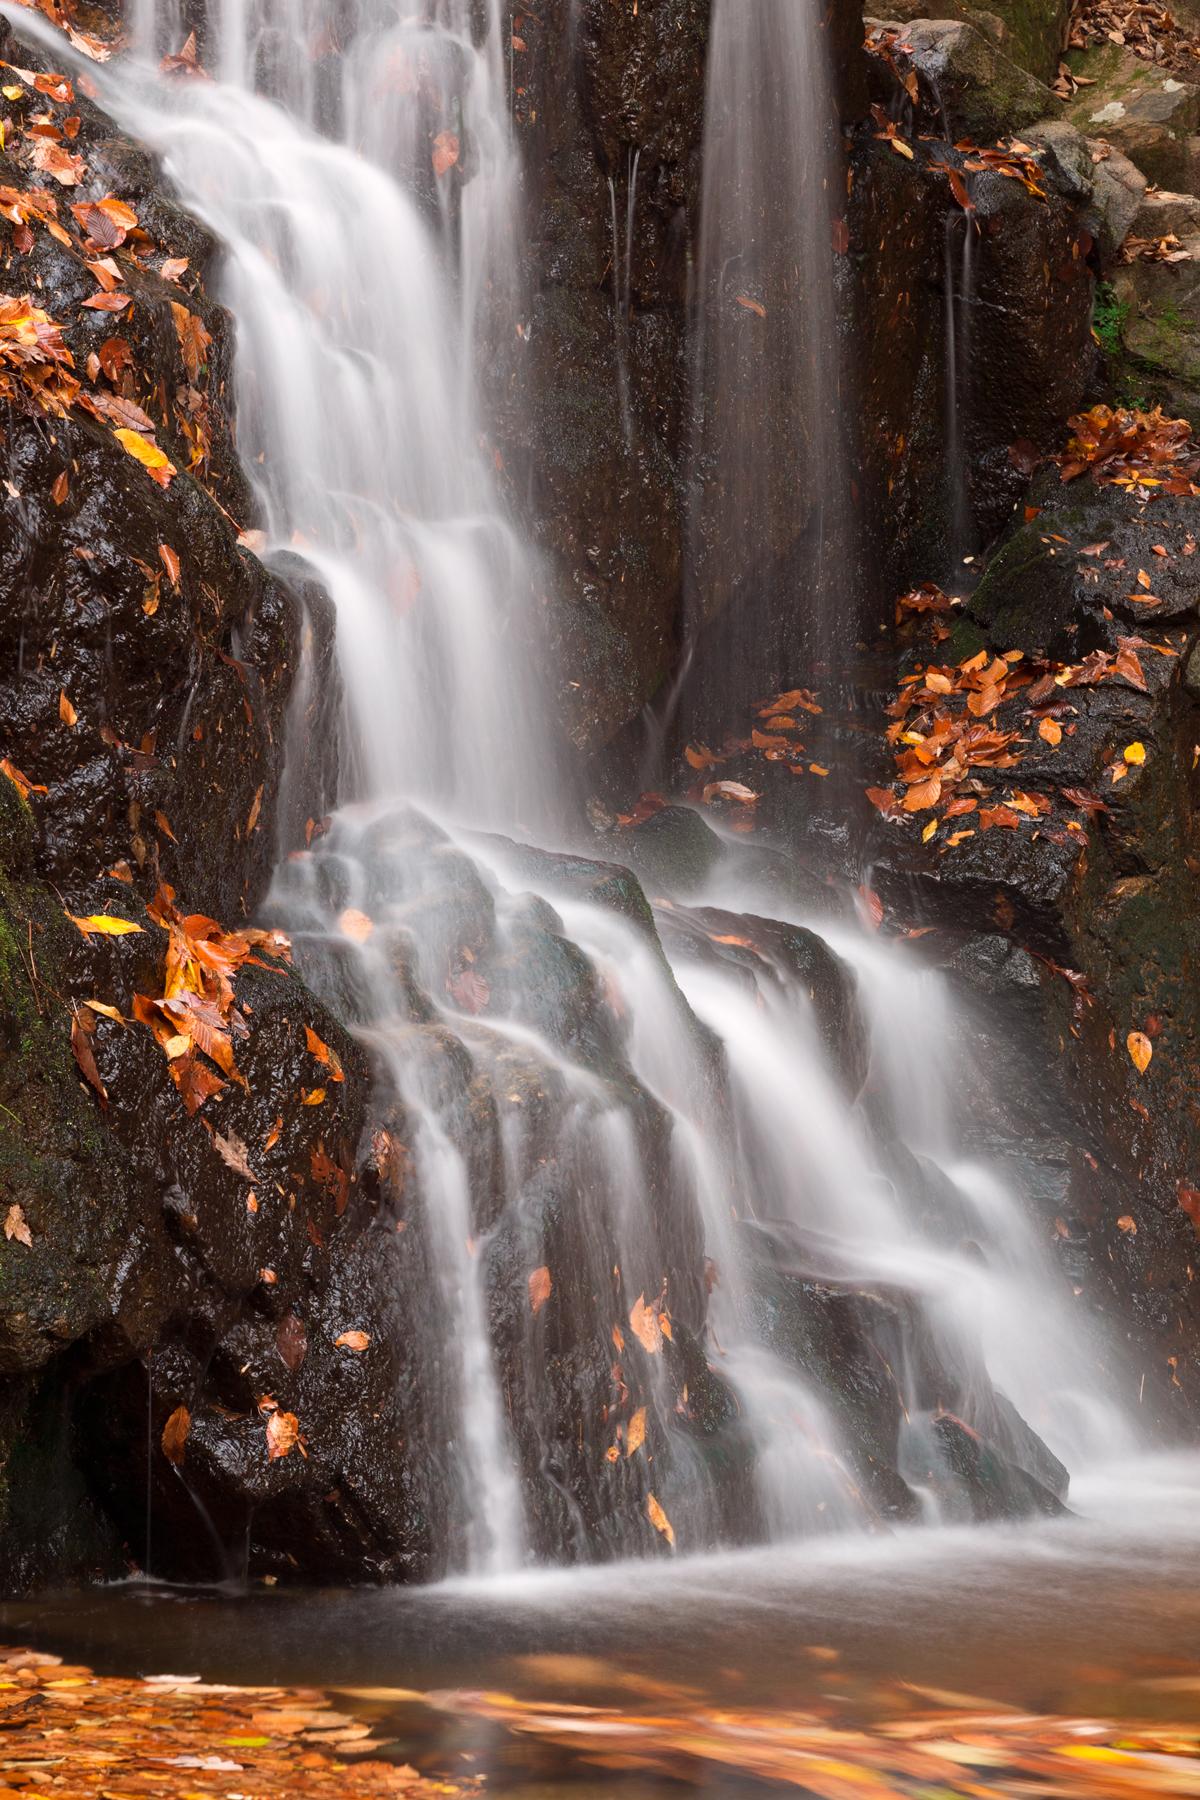 Avalon Falls, Quiet, Red, Pretty, Picturesque, HQ Photo